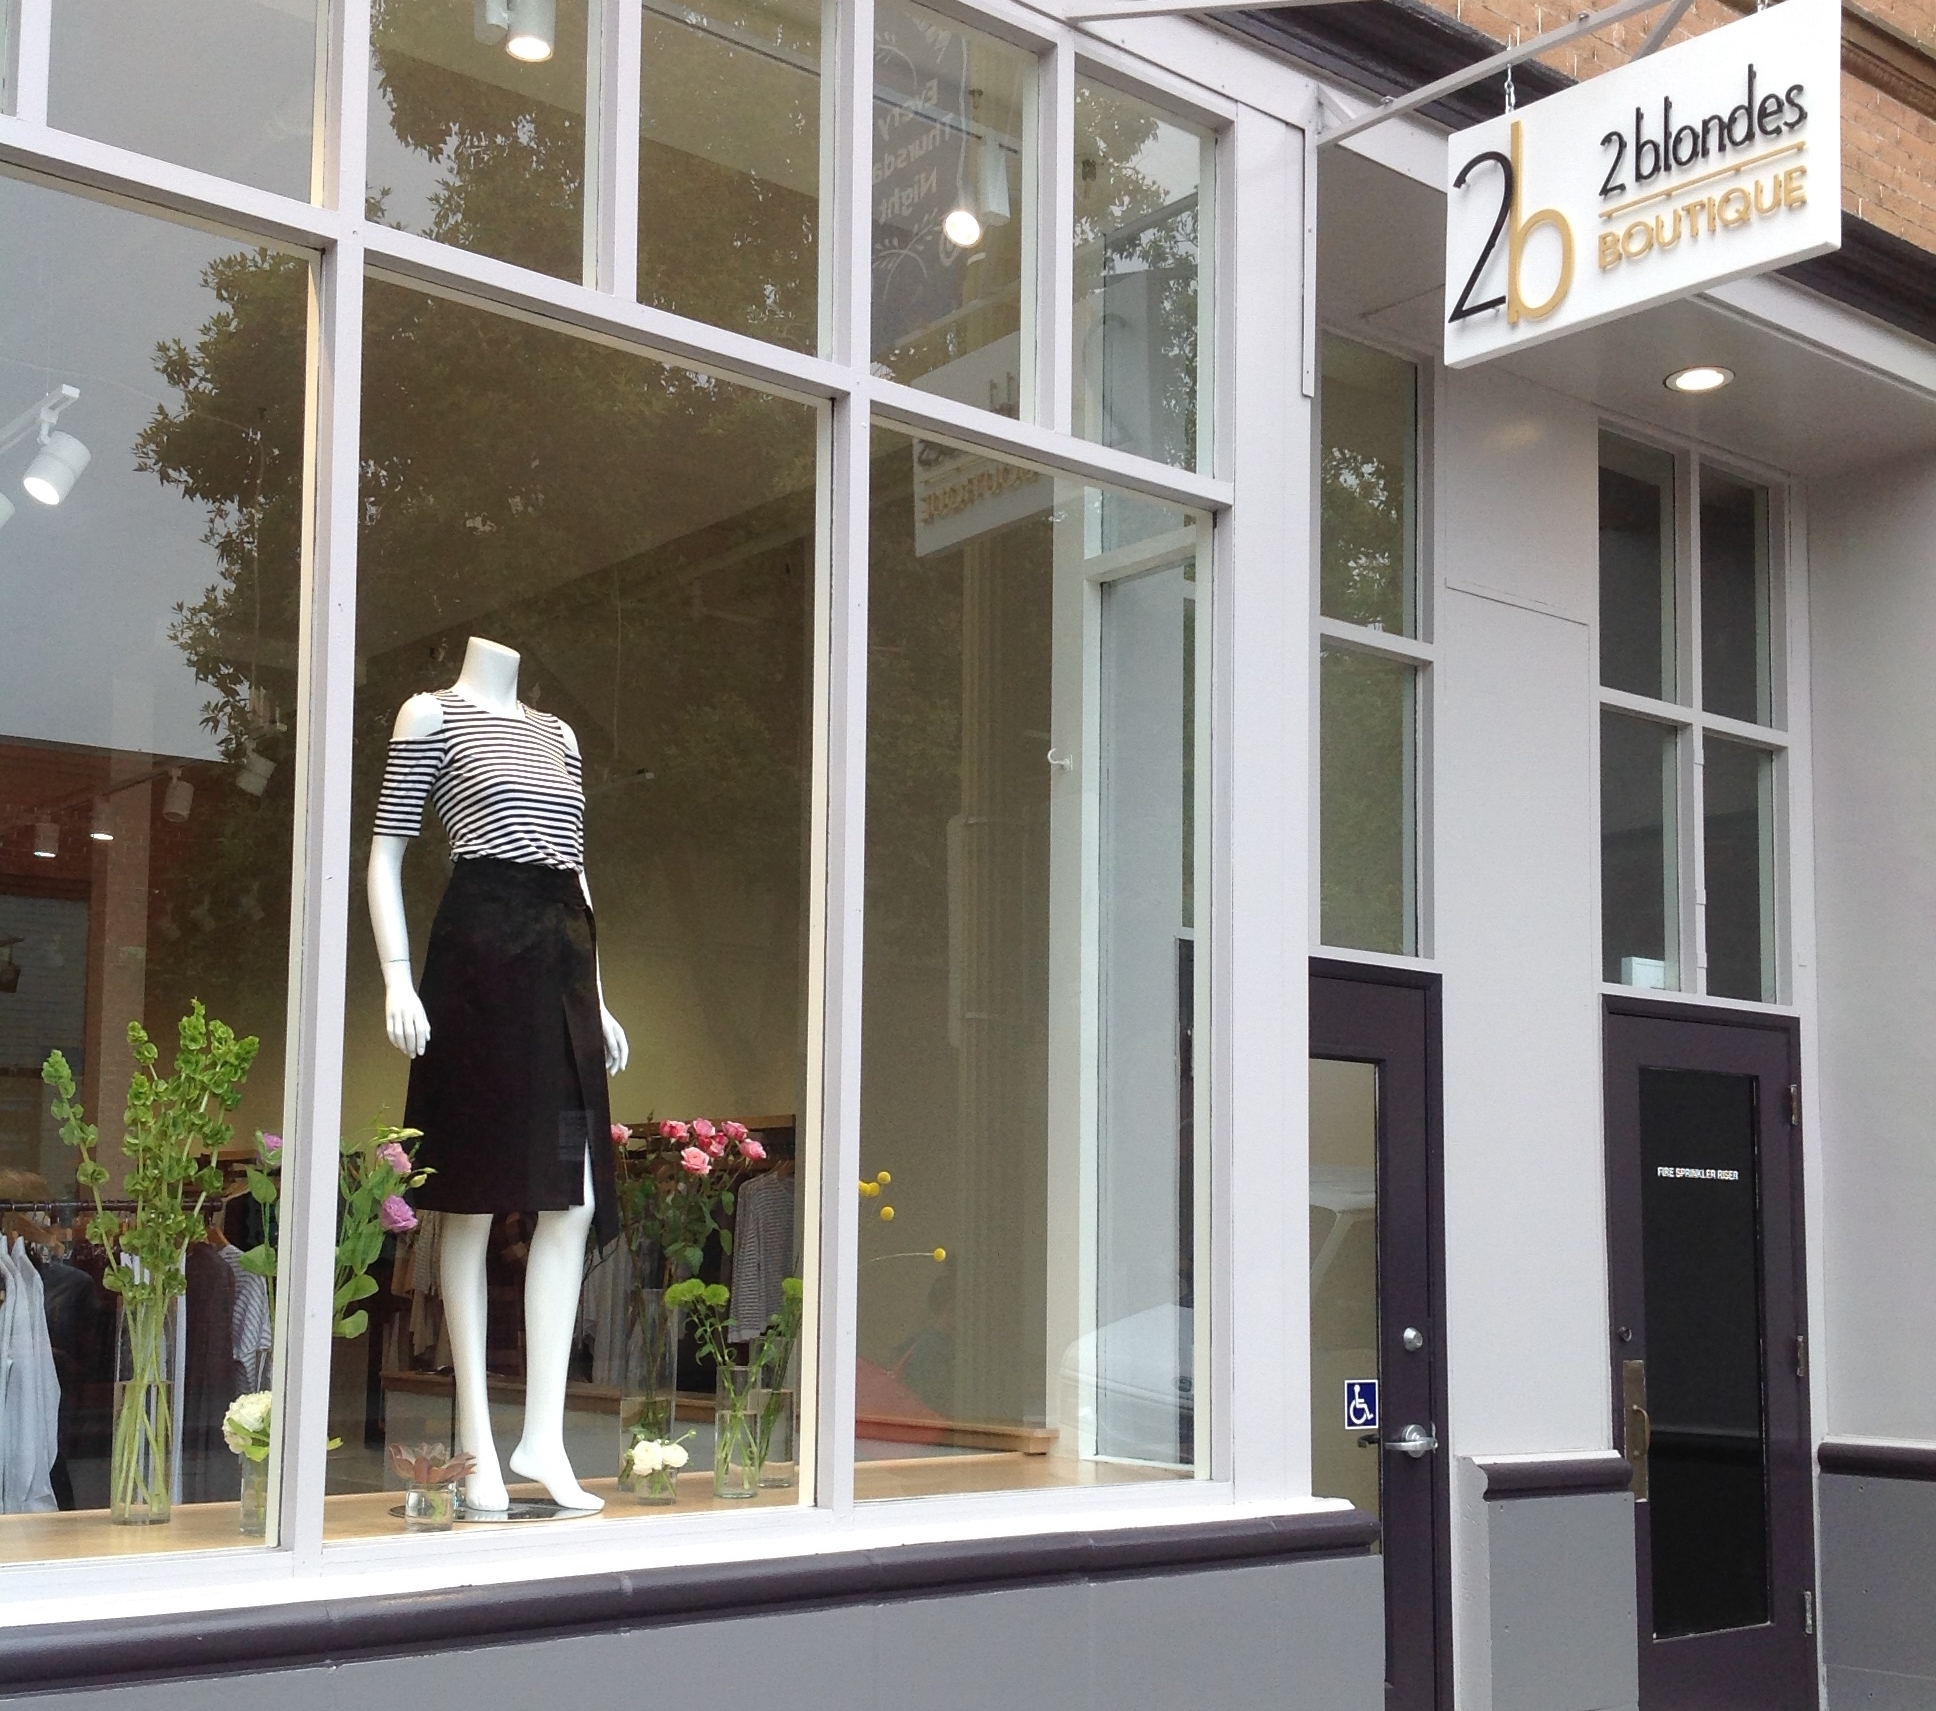 Tenant Improvement, interior remodel for 2 Blondes Boutique in San Luis Obispo, Ca.